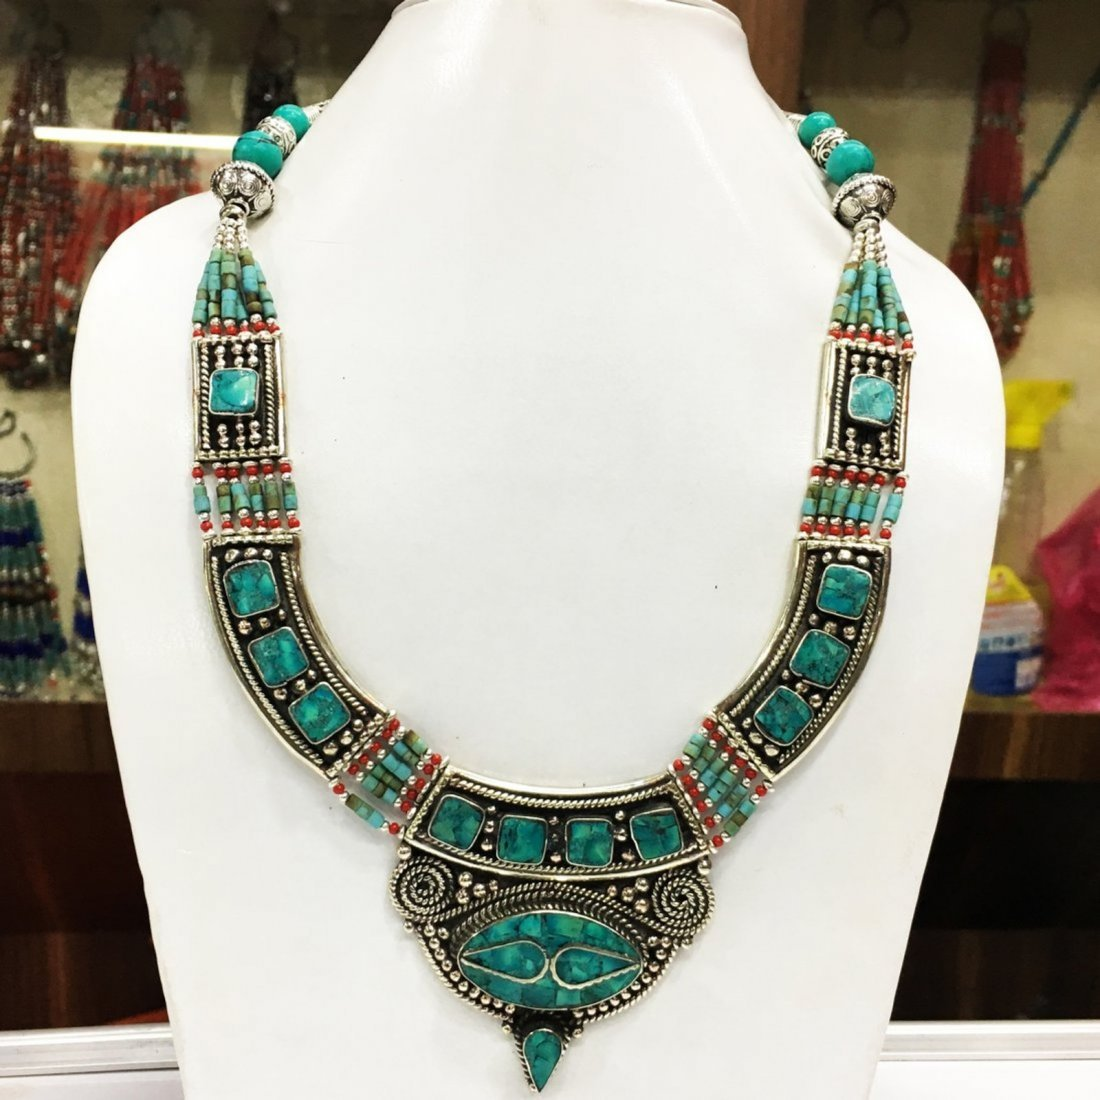 Tibetan Turquoise Handmade Necklace